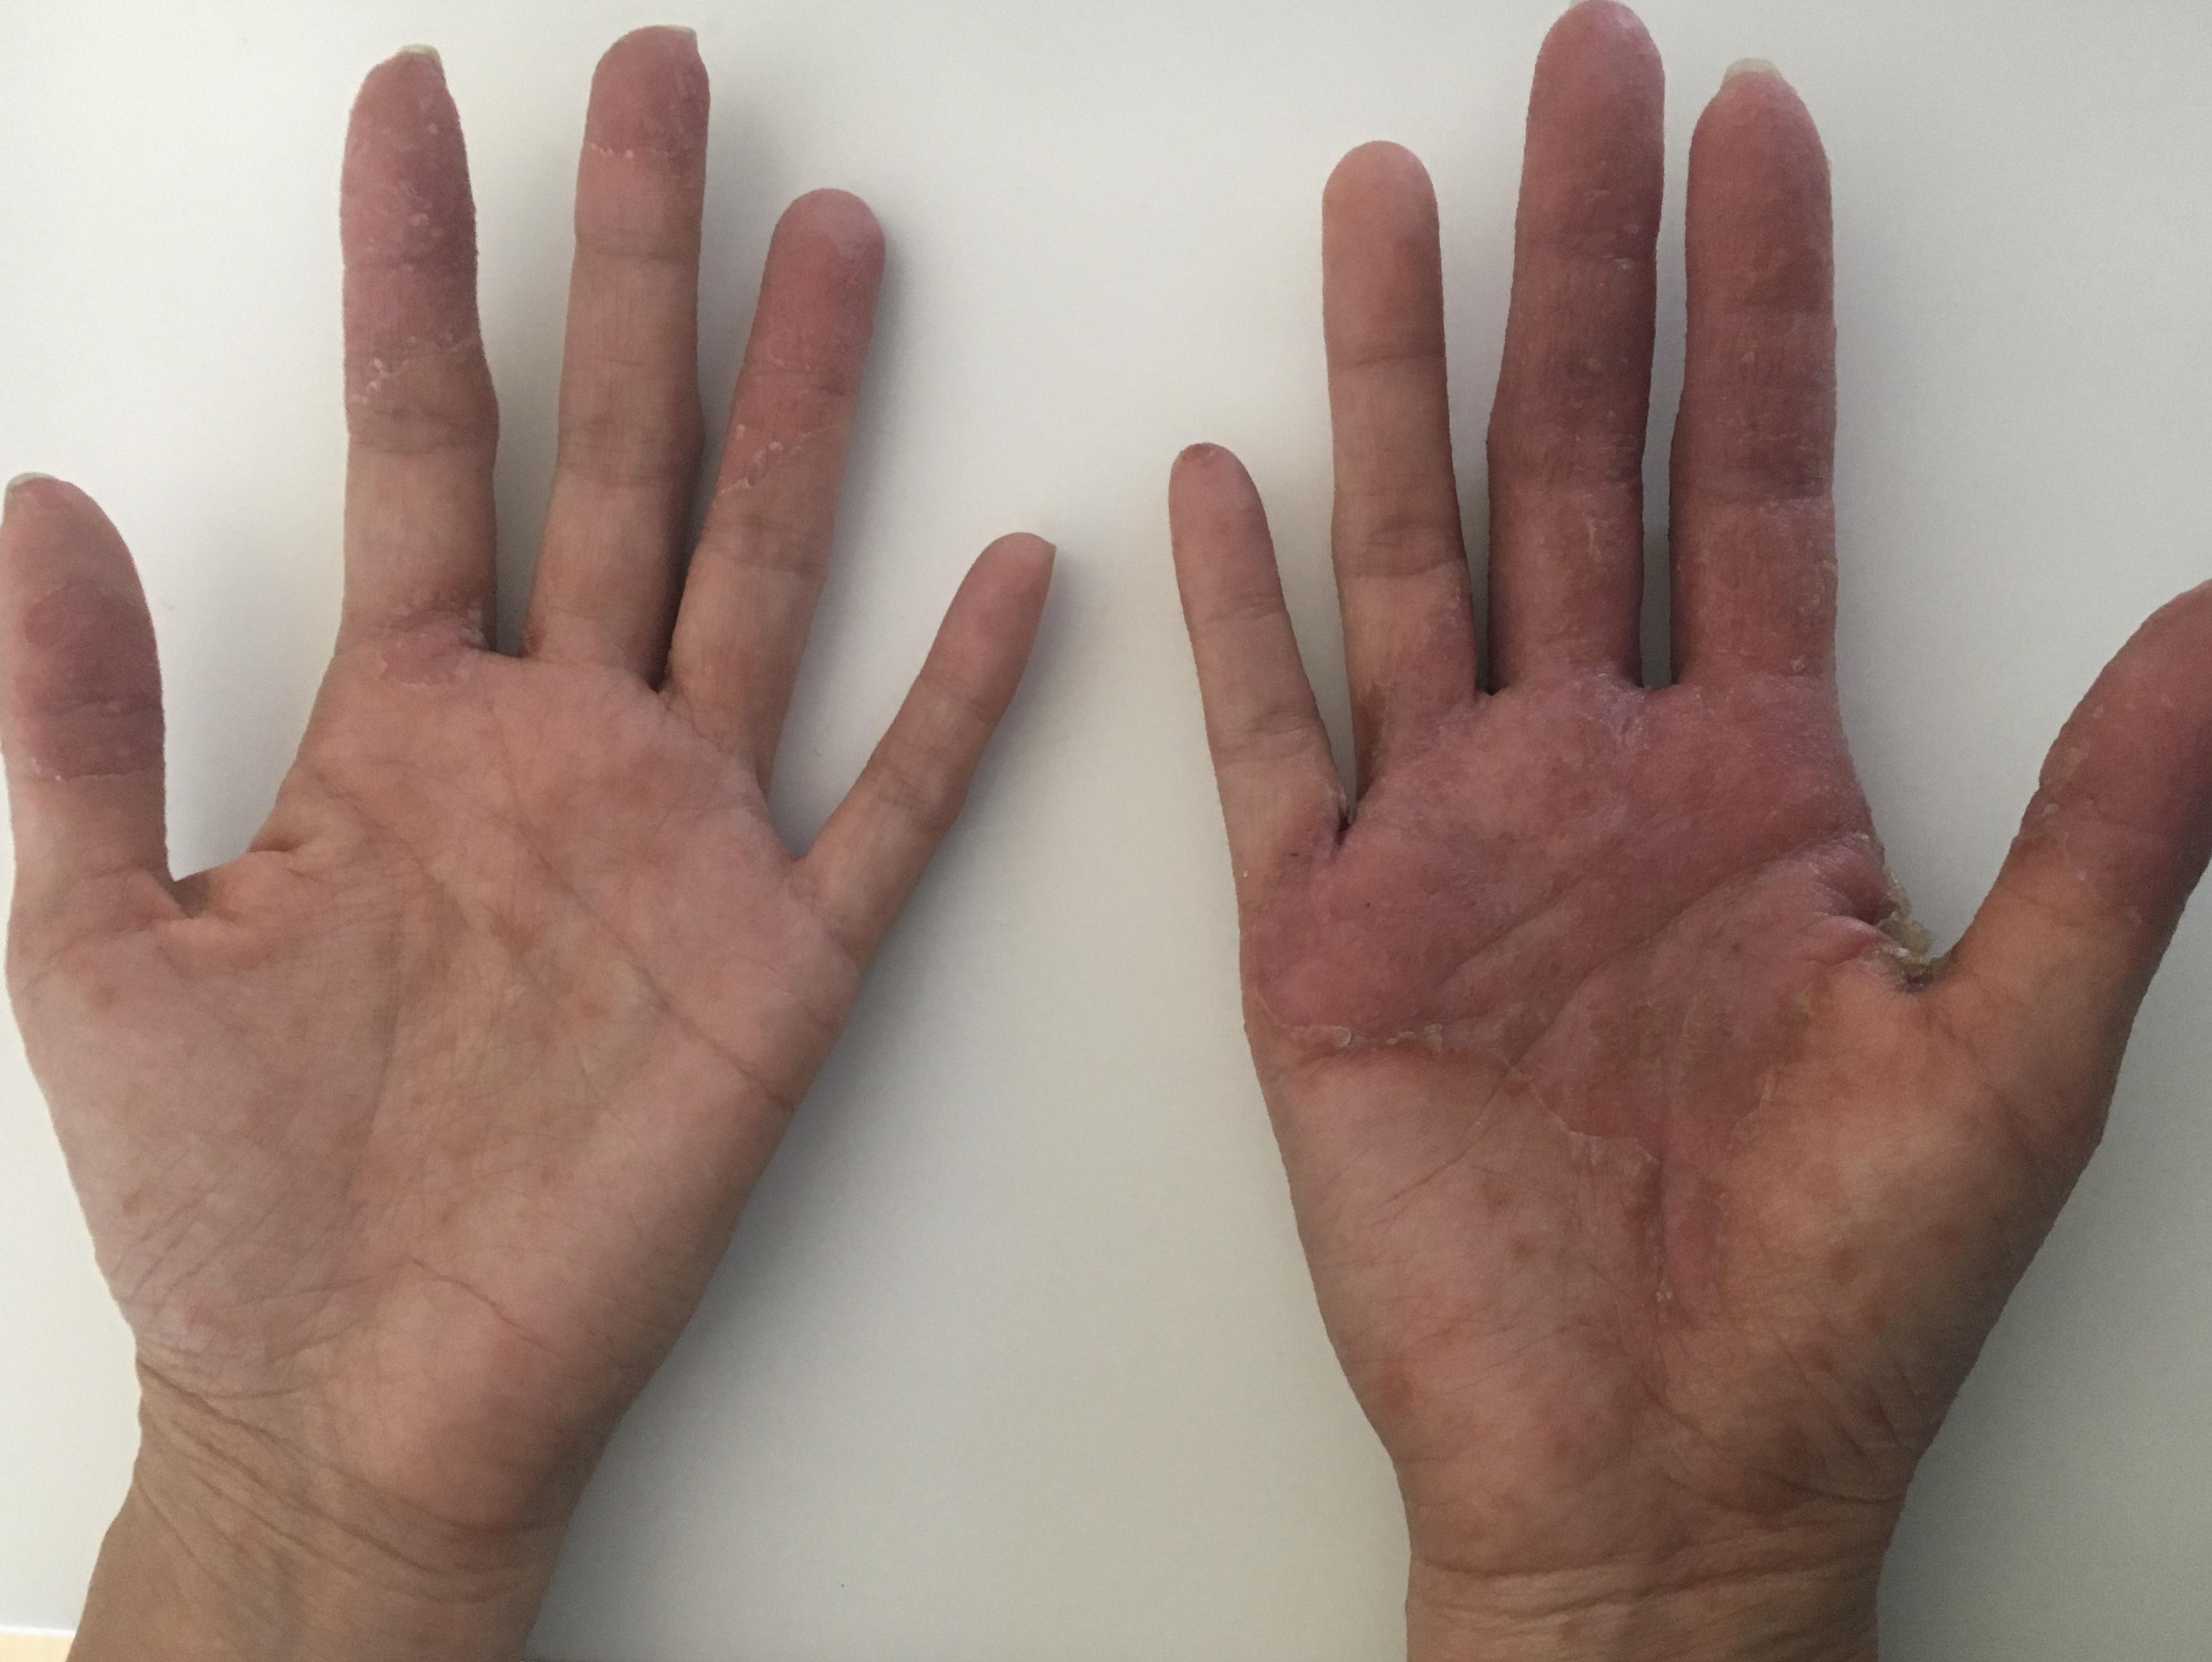 Core Programs Skin Health Before Treatment Image